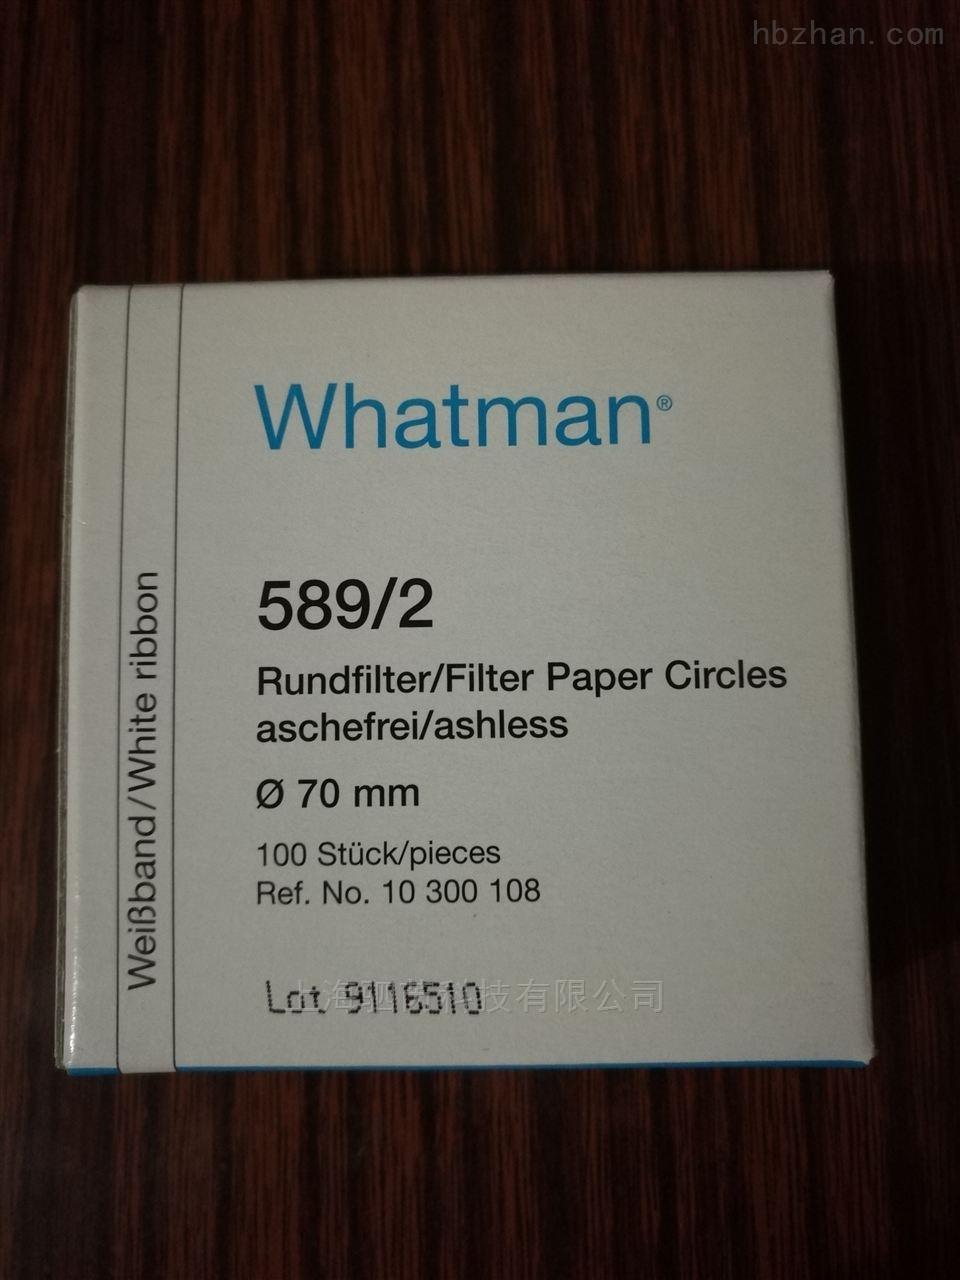 Whatman 沃特曼定量滤纸 Grade 589/2